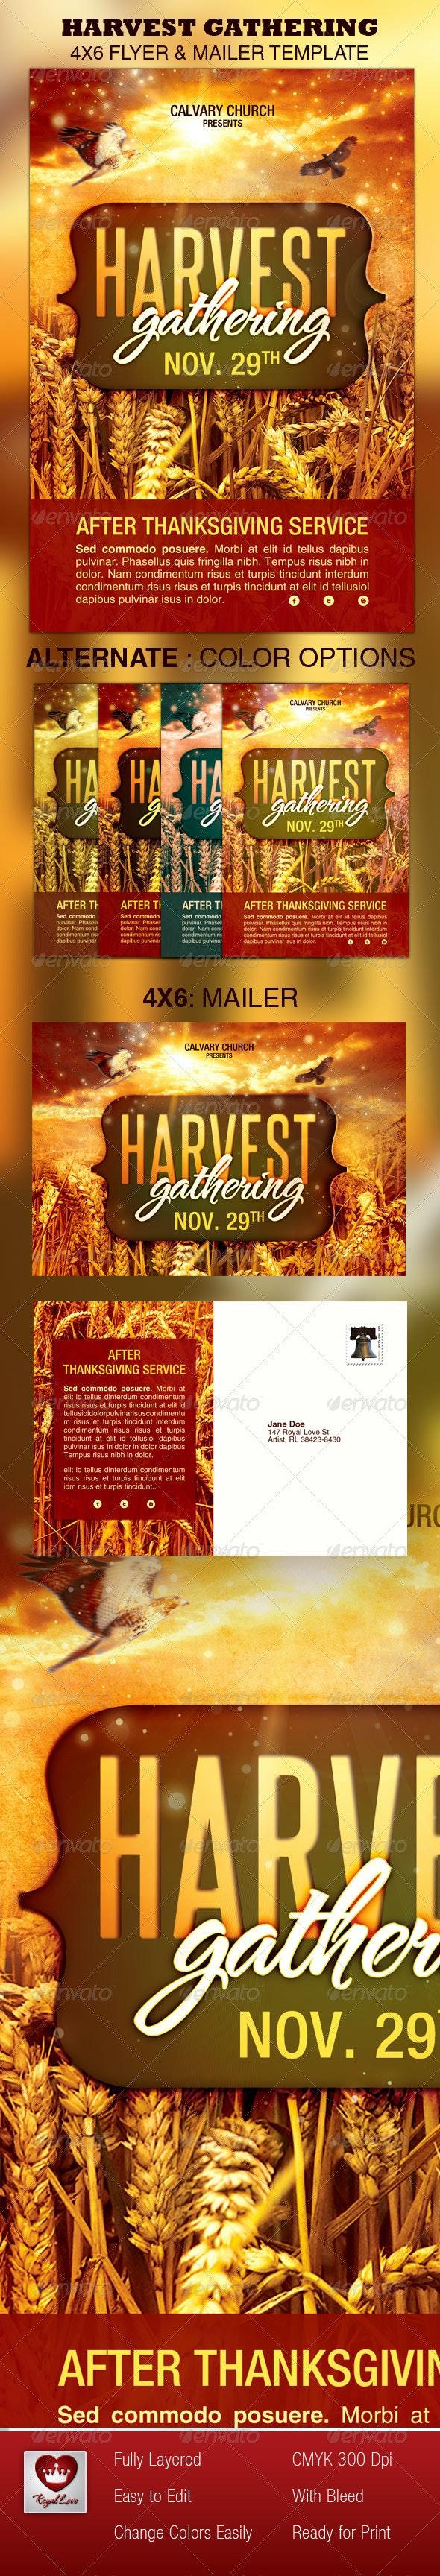 Harvest Gathering Church Flyer & Mailer Template - Church Flyers